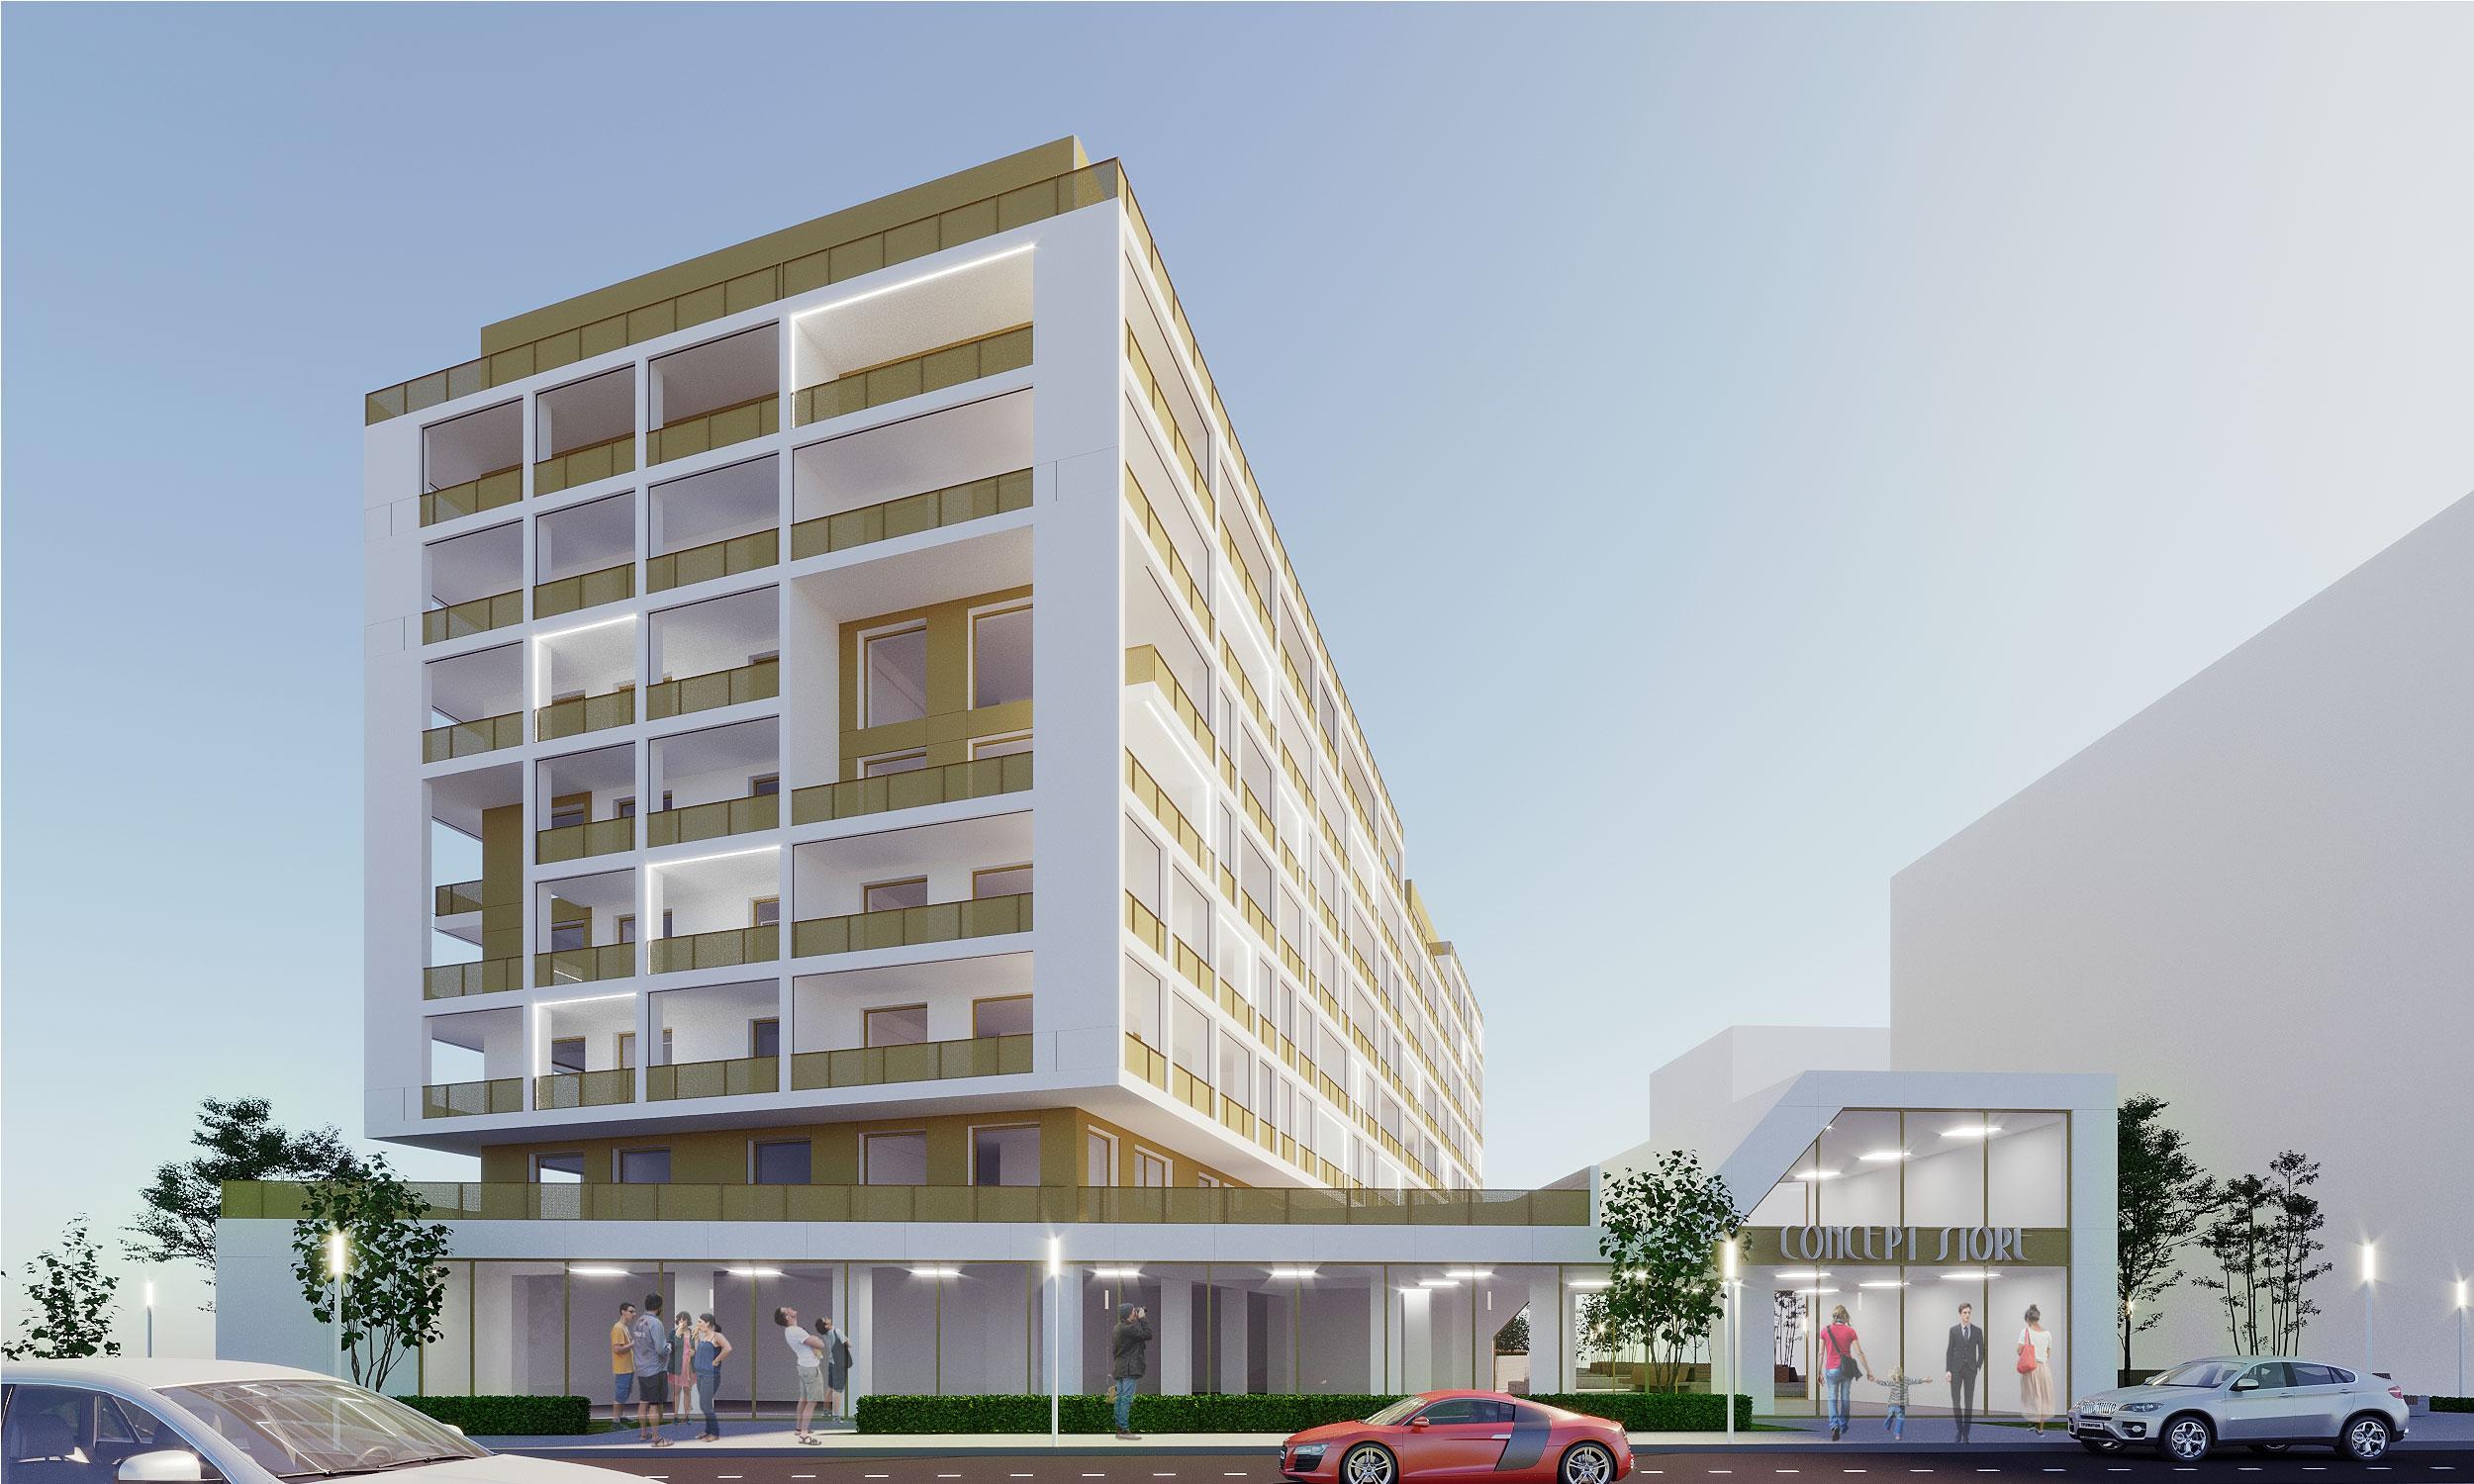 https://nbc-arhitect.ro/wp-content/uploads/2020/10/NBC-Arhitect-_-Glucoza-Residence-_-Bucharest-Romania-_-exterior-view_3-1.jpg